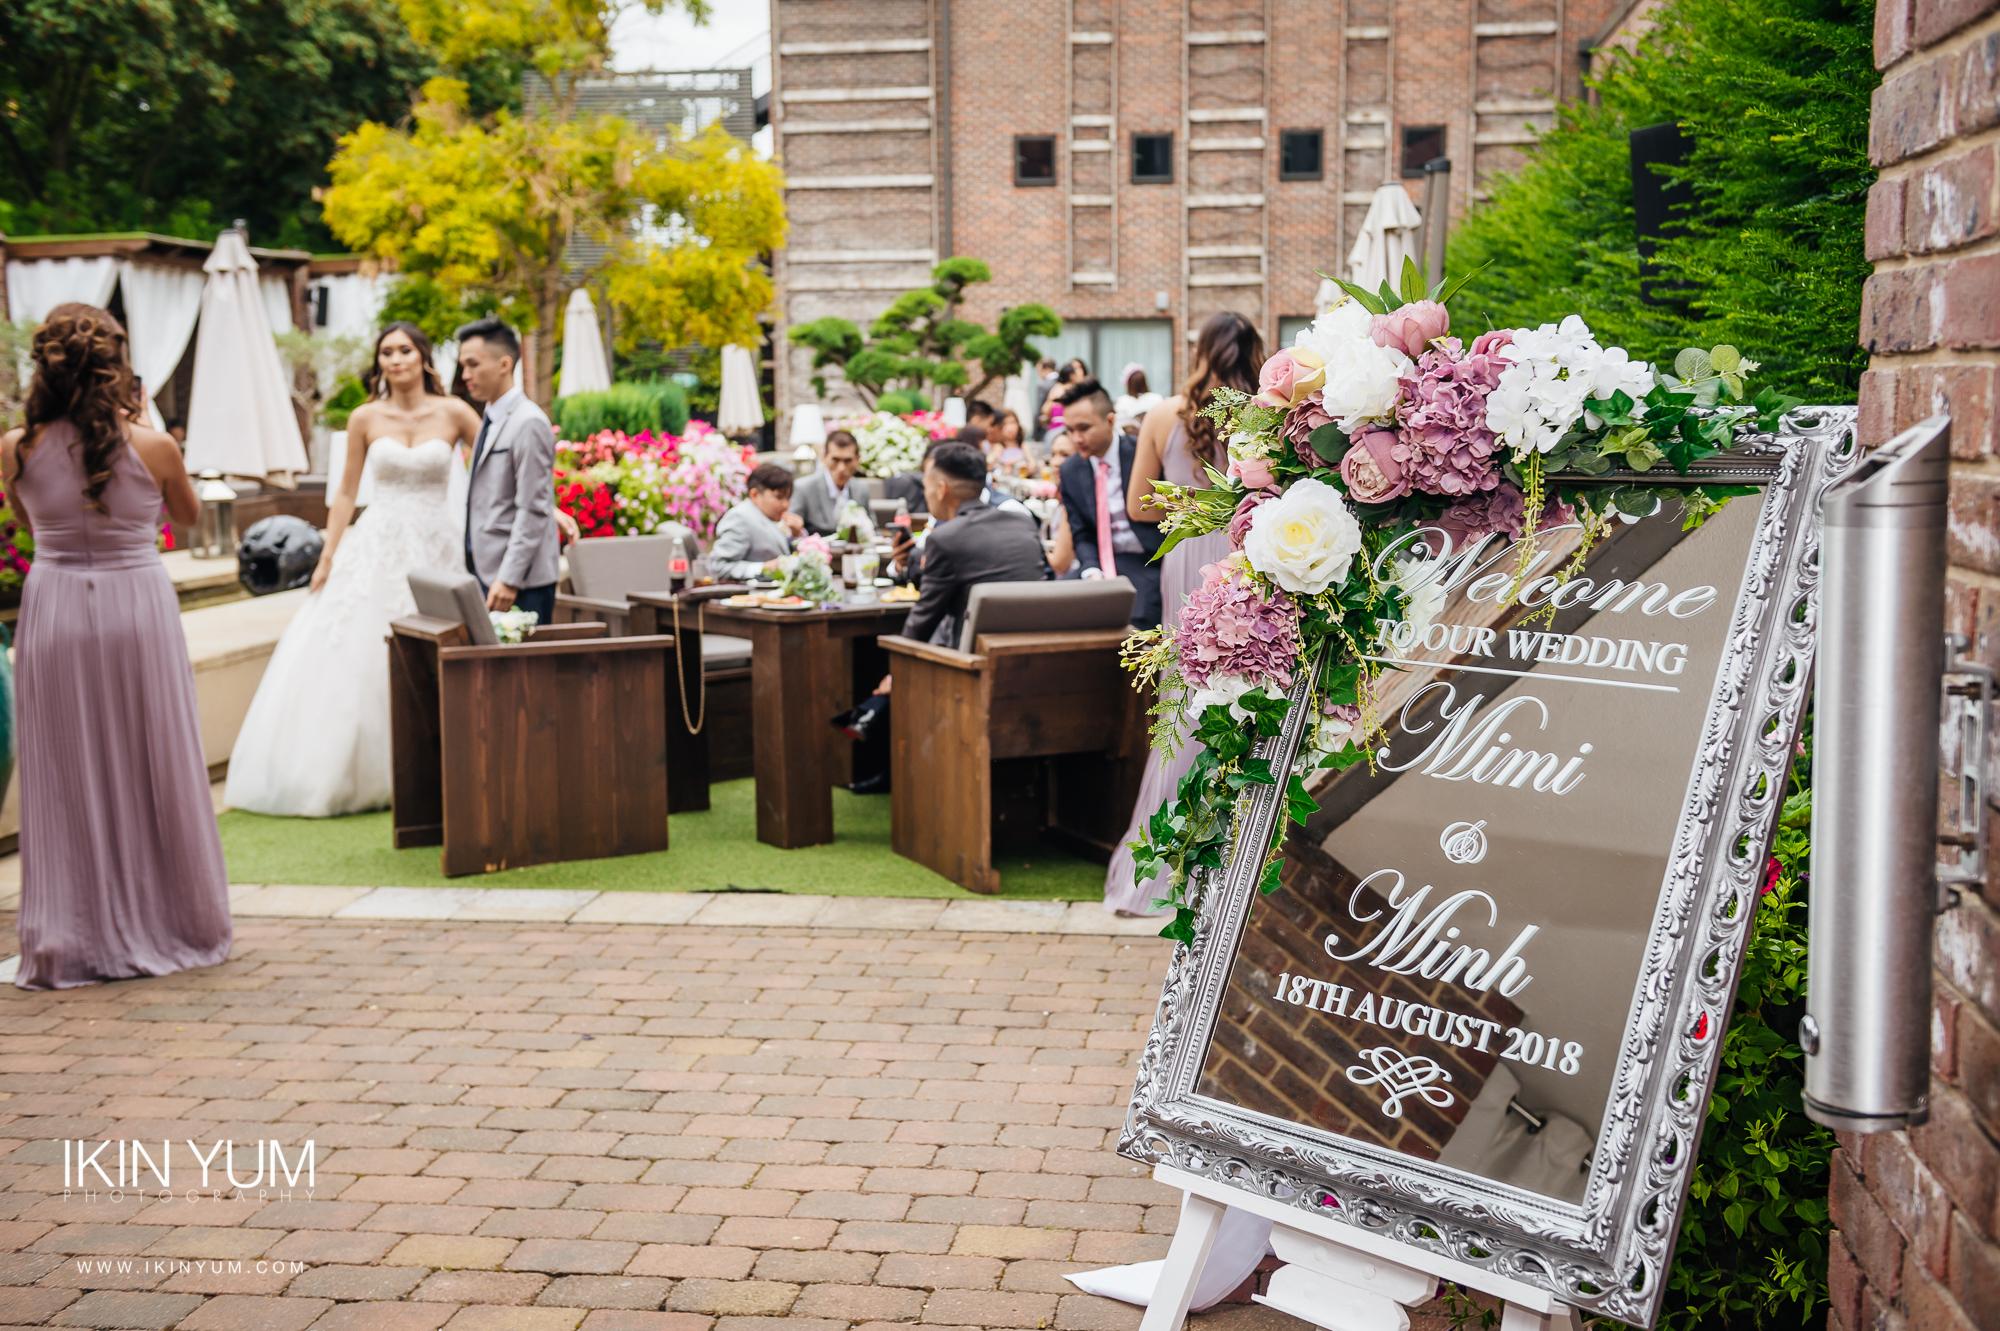 Syon Park Wedding - Ikin Yum Photography -093.jpg